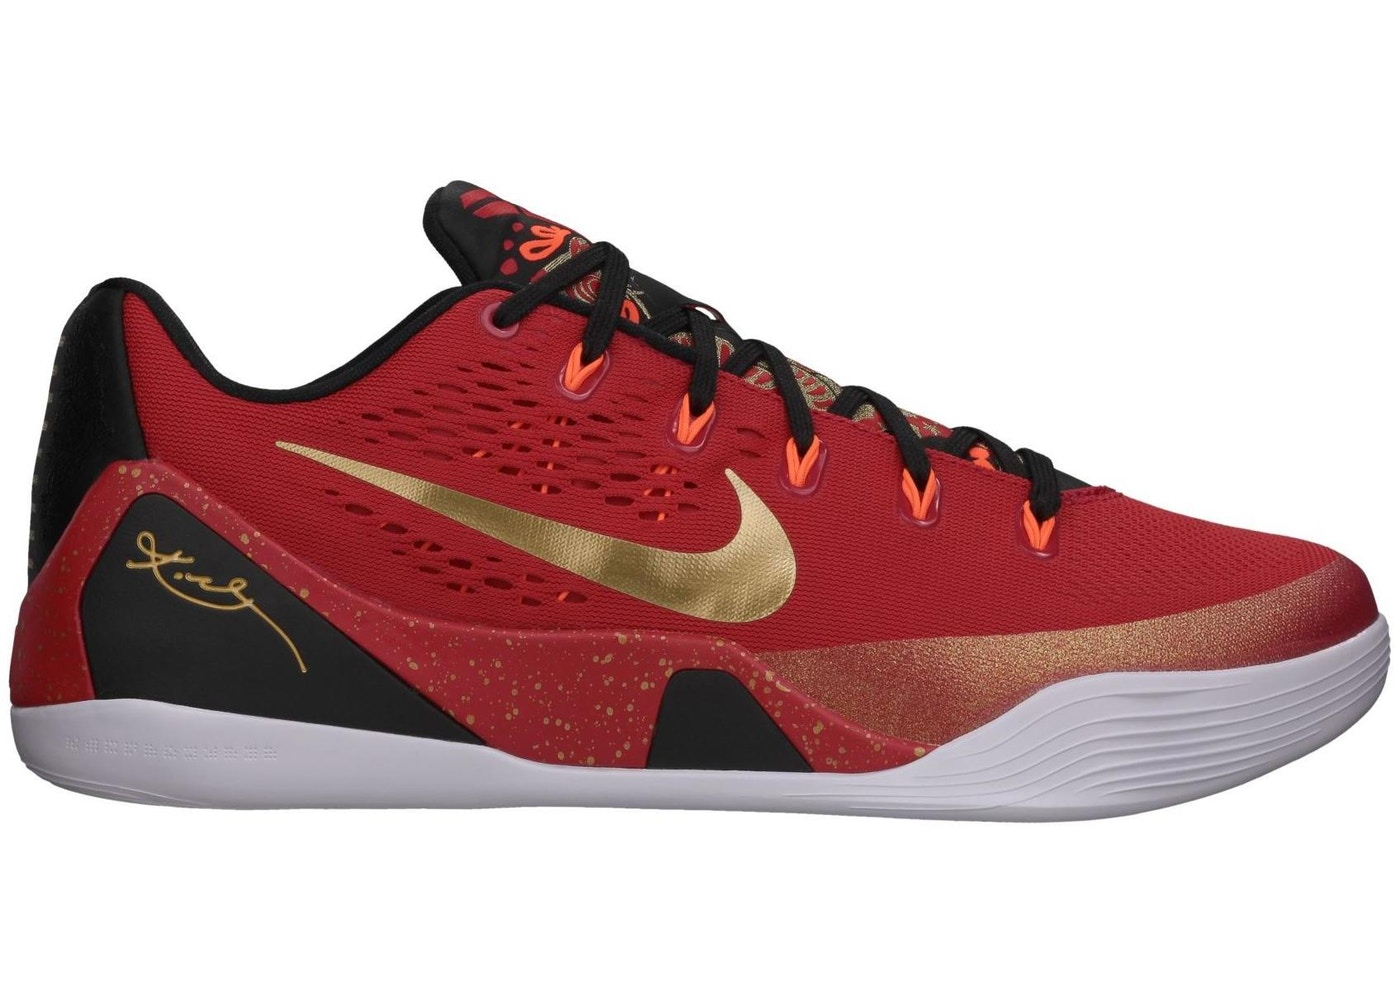 watch aa799 2a6cd Nike Kobe 9 Shoes - Lowest Ask